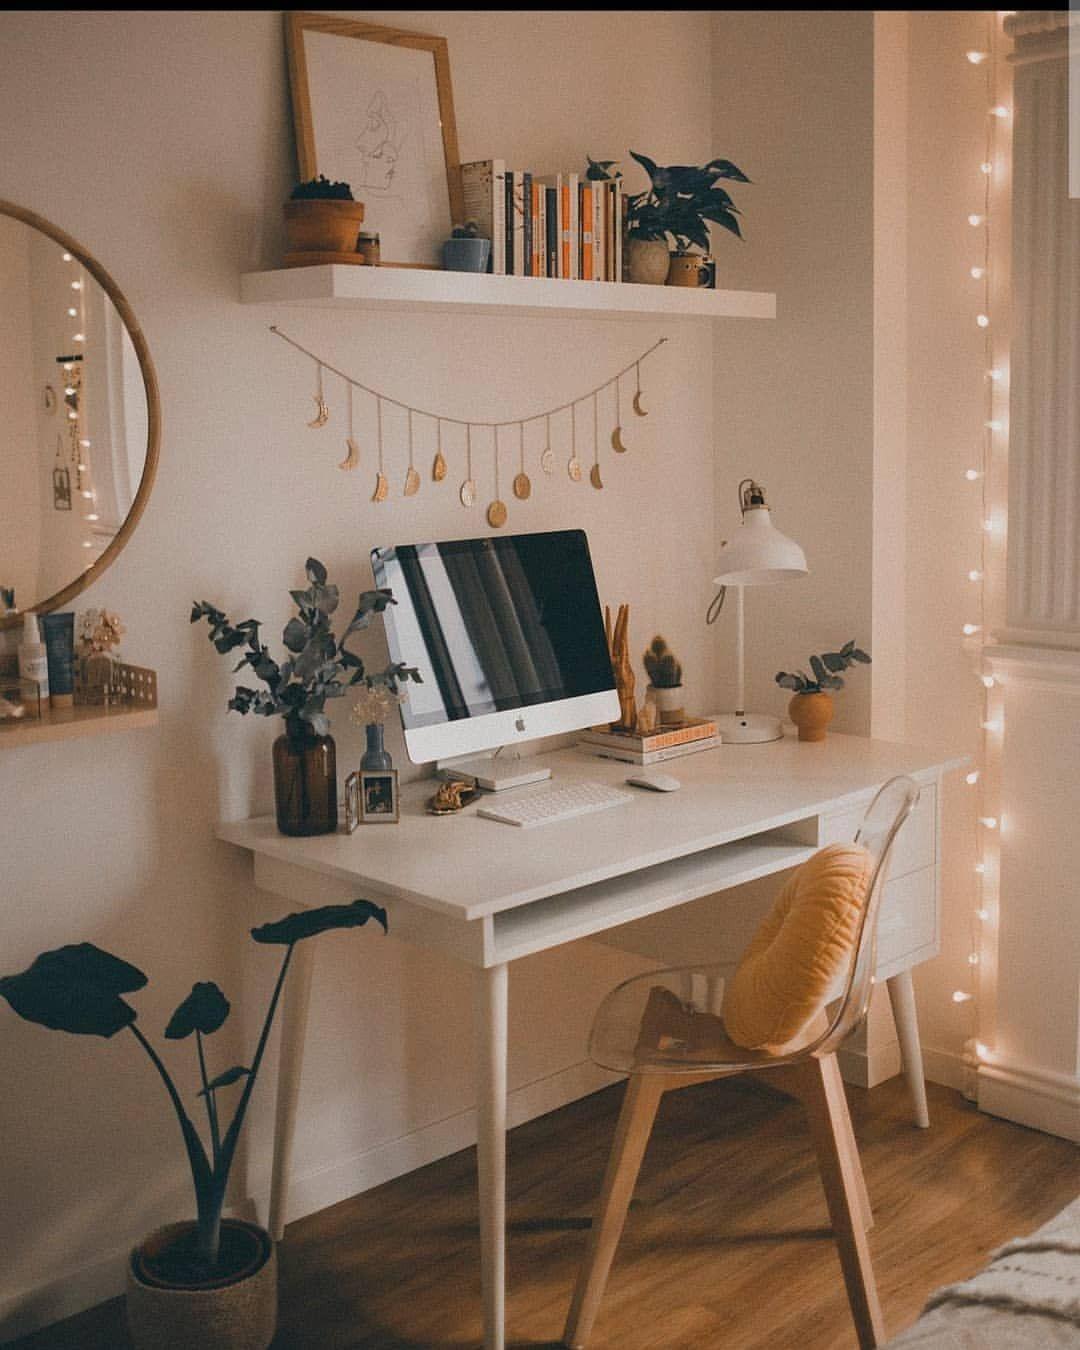 "�������������� on Instagram: ""���� Home Office ���� . . �: @archesandterracotta . . #interioryesplz #mybeigelife #mybohovibes #beige #bedroomdecor #bedinspo…"""